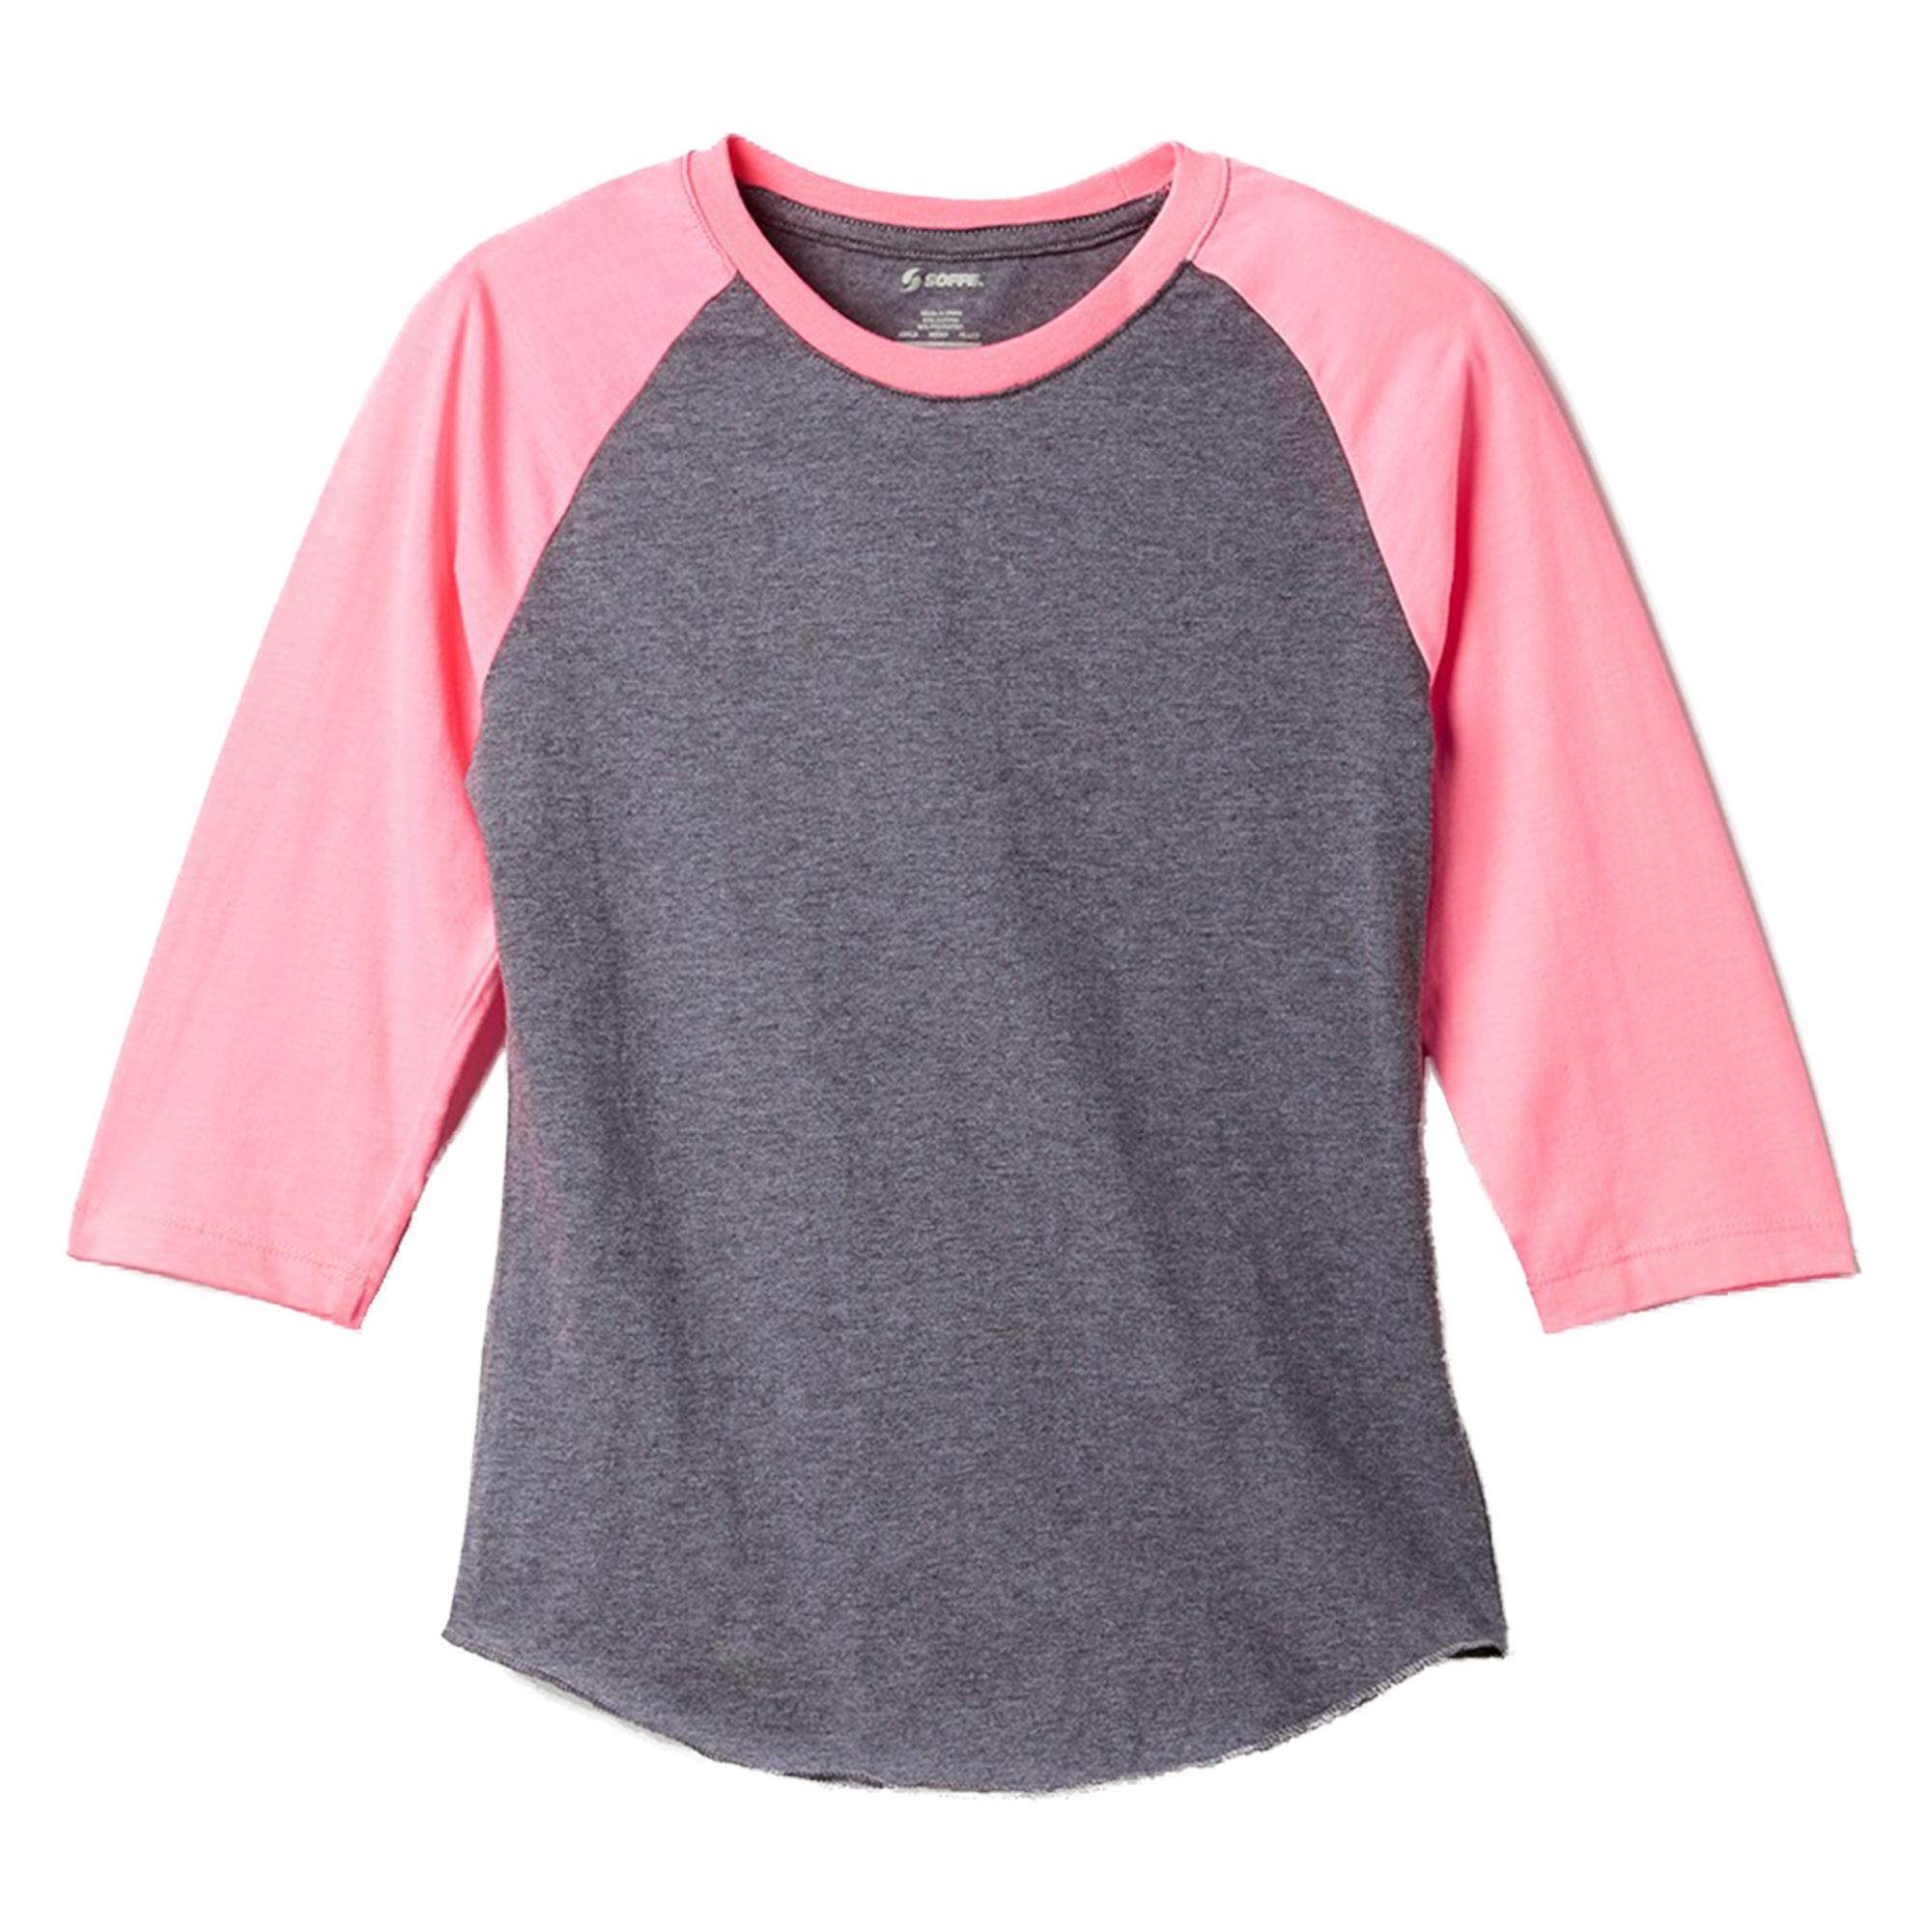 Soffe Women's Heathered Baseball T-Shirt